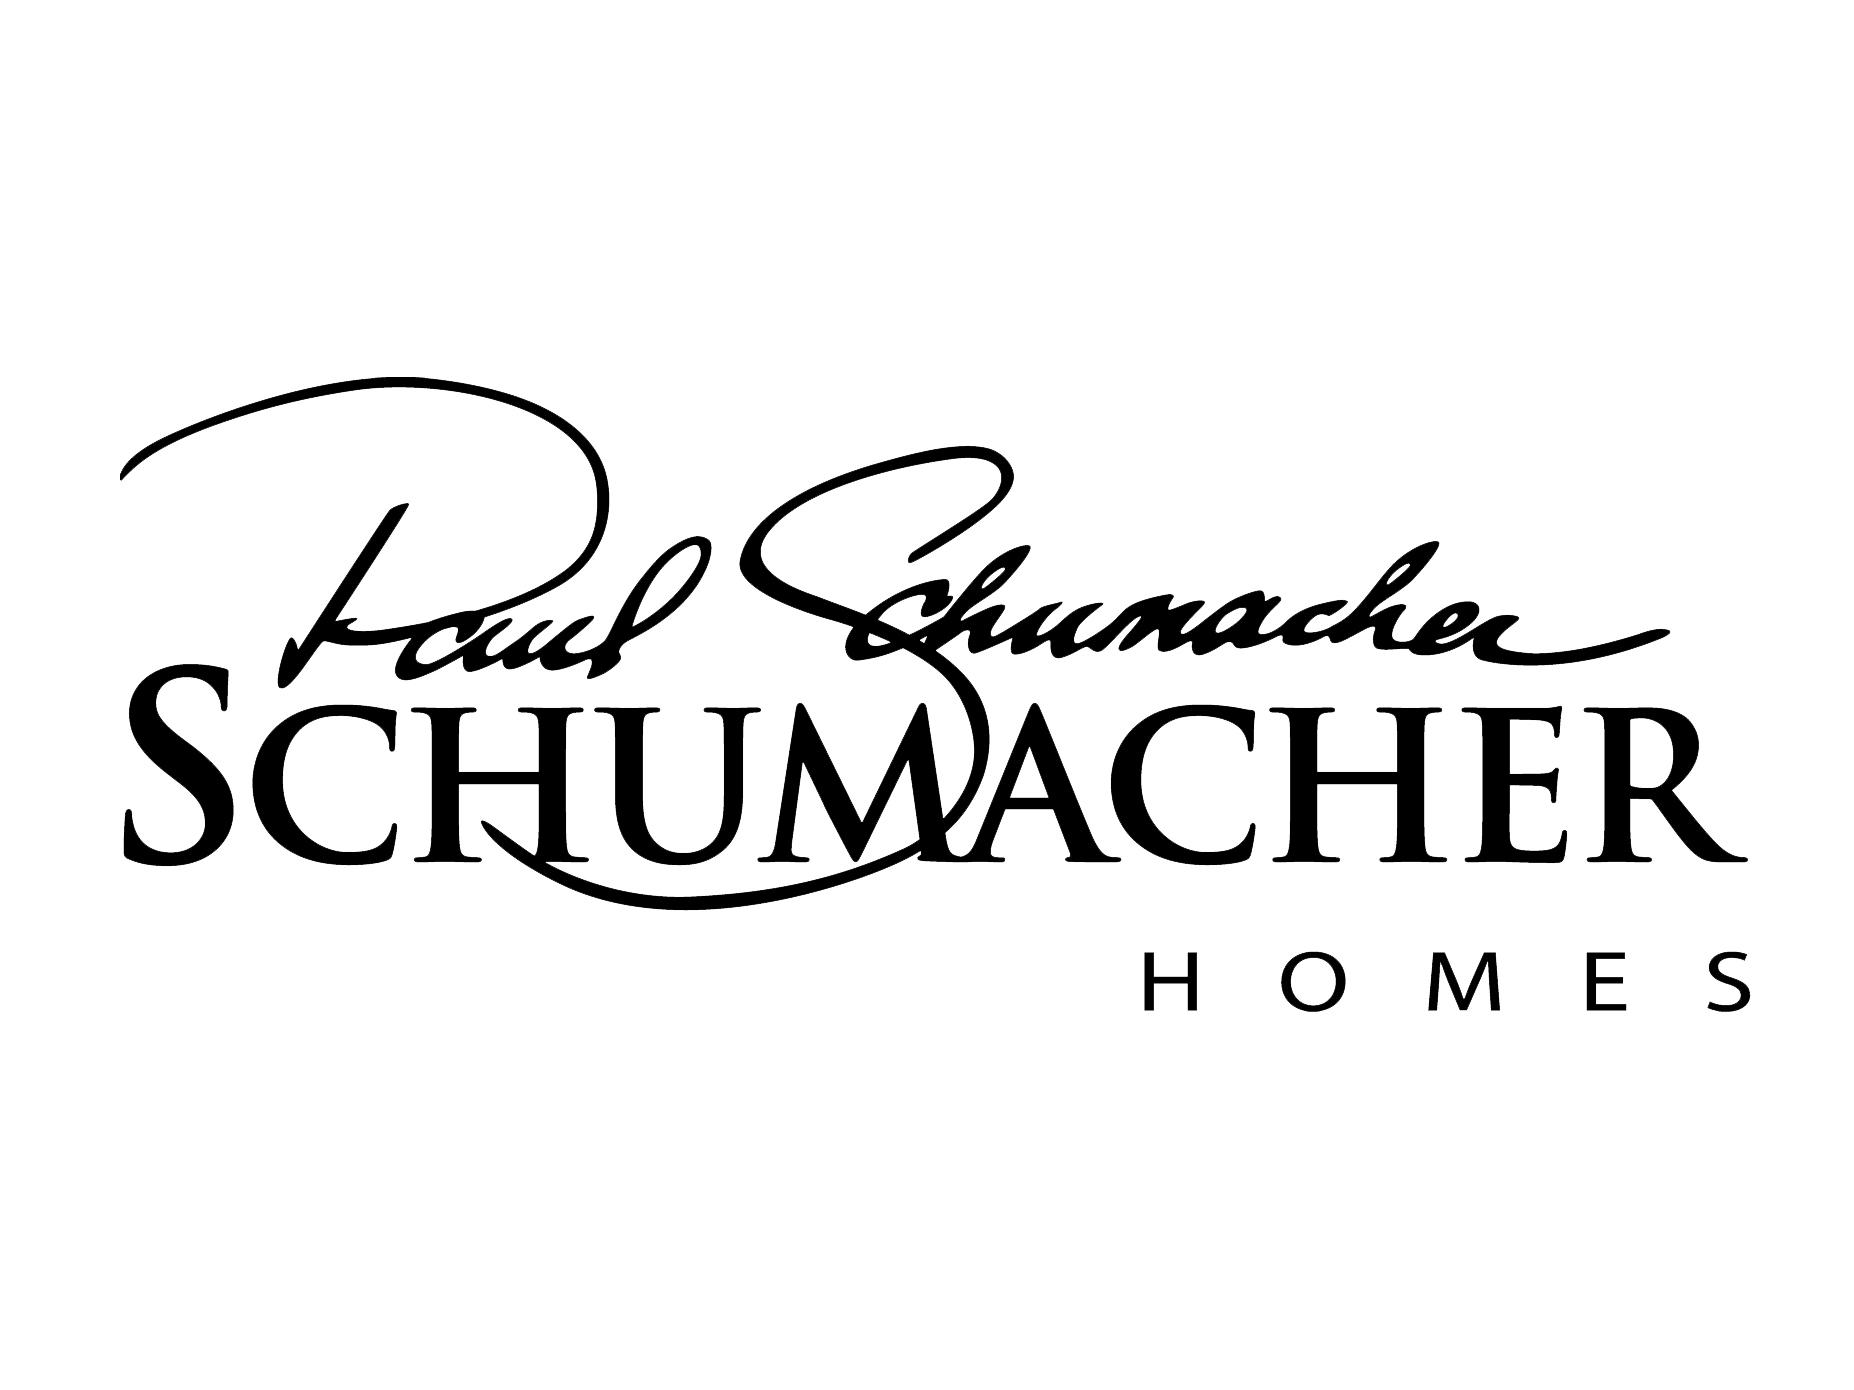 SchumacherHomes (Internet).jpg